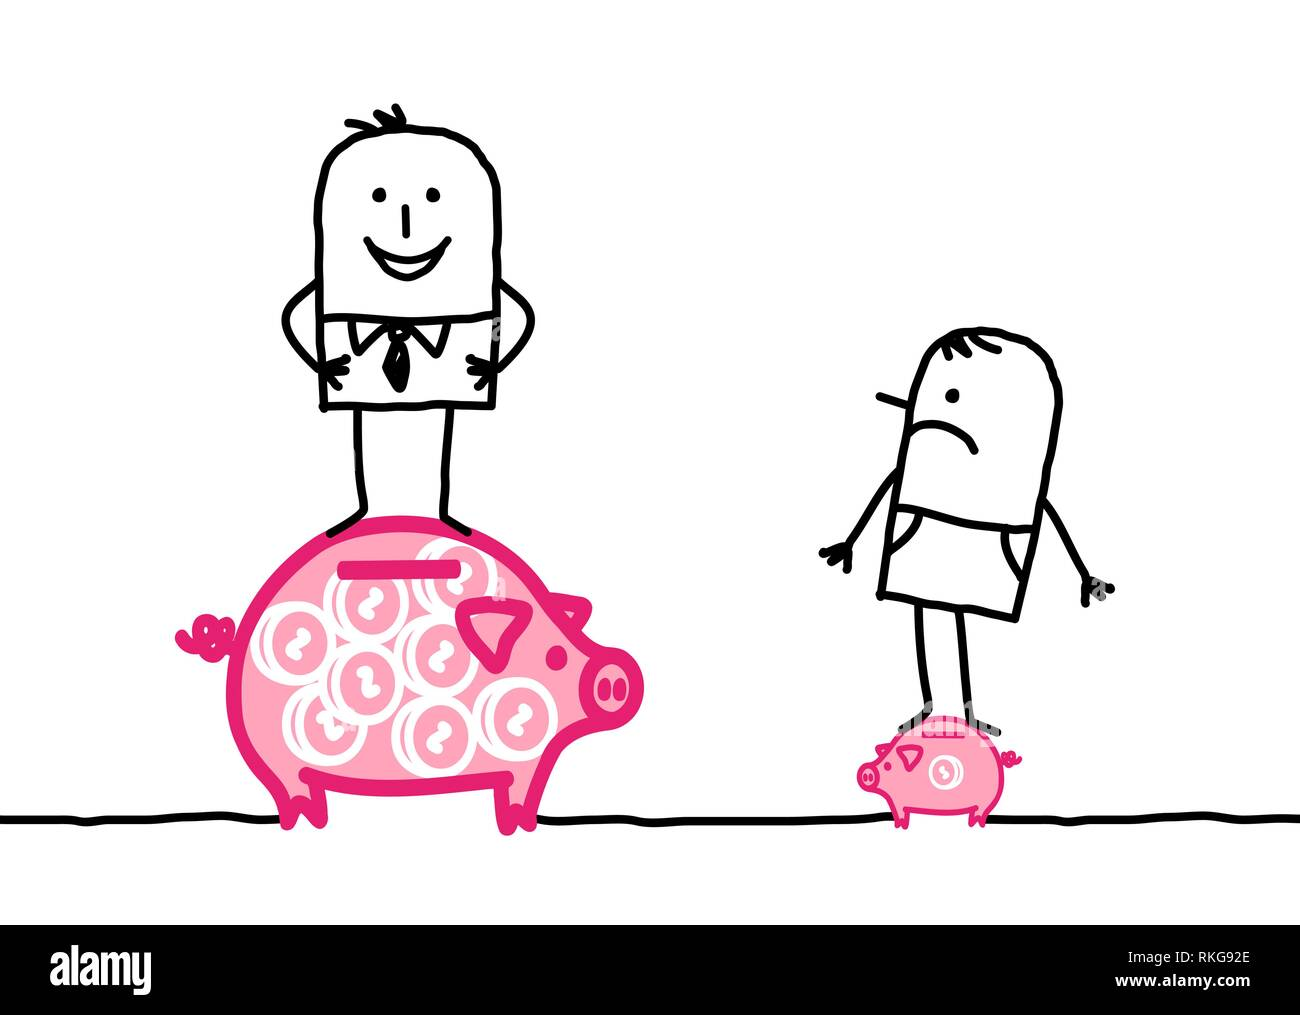 Cartoon rich man and poor man - Stock Image